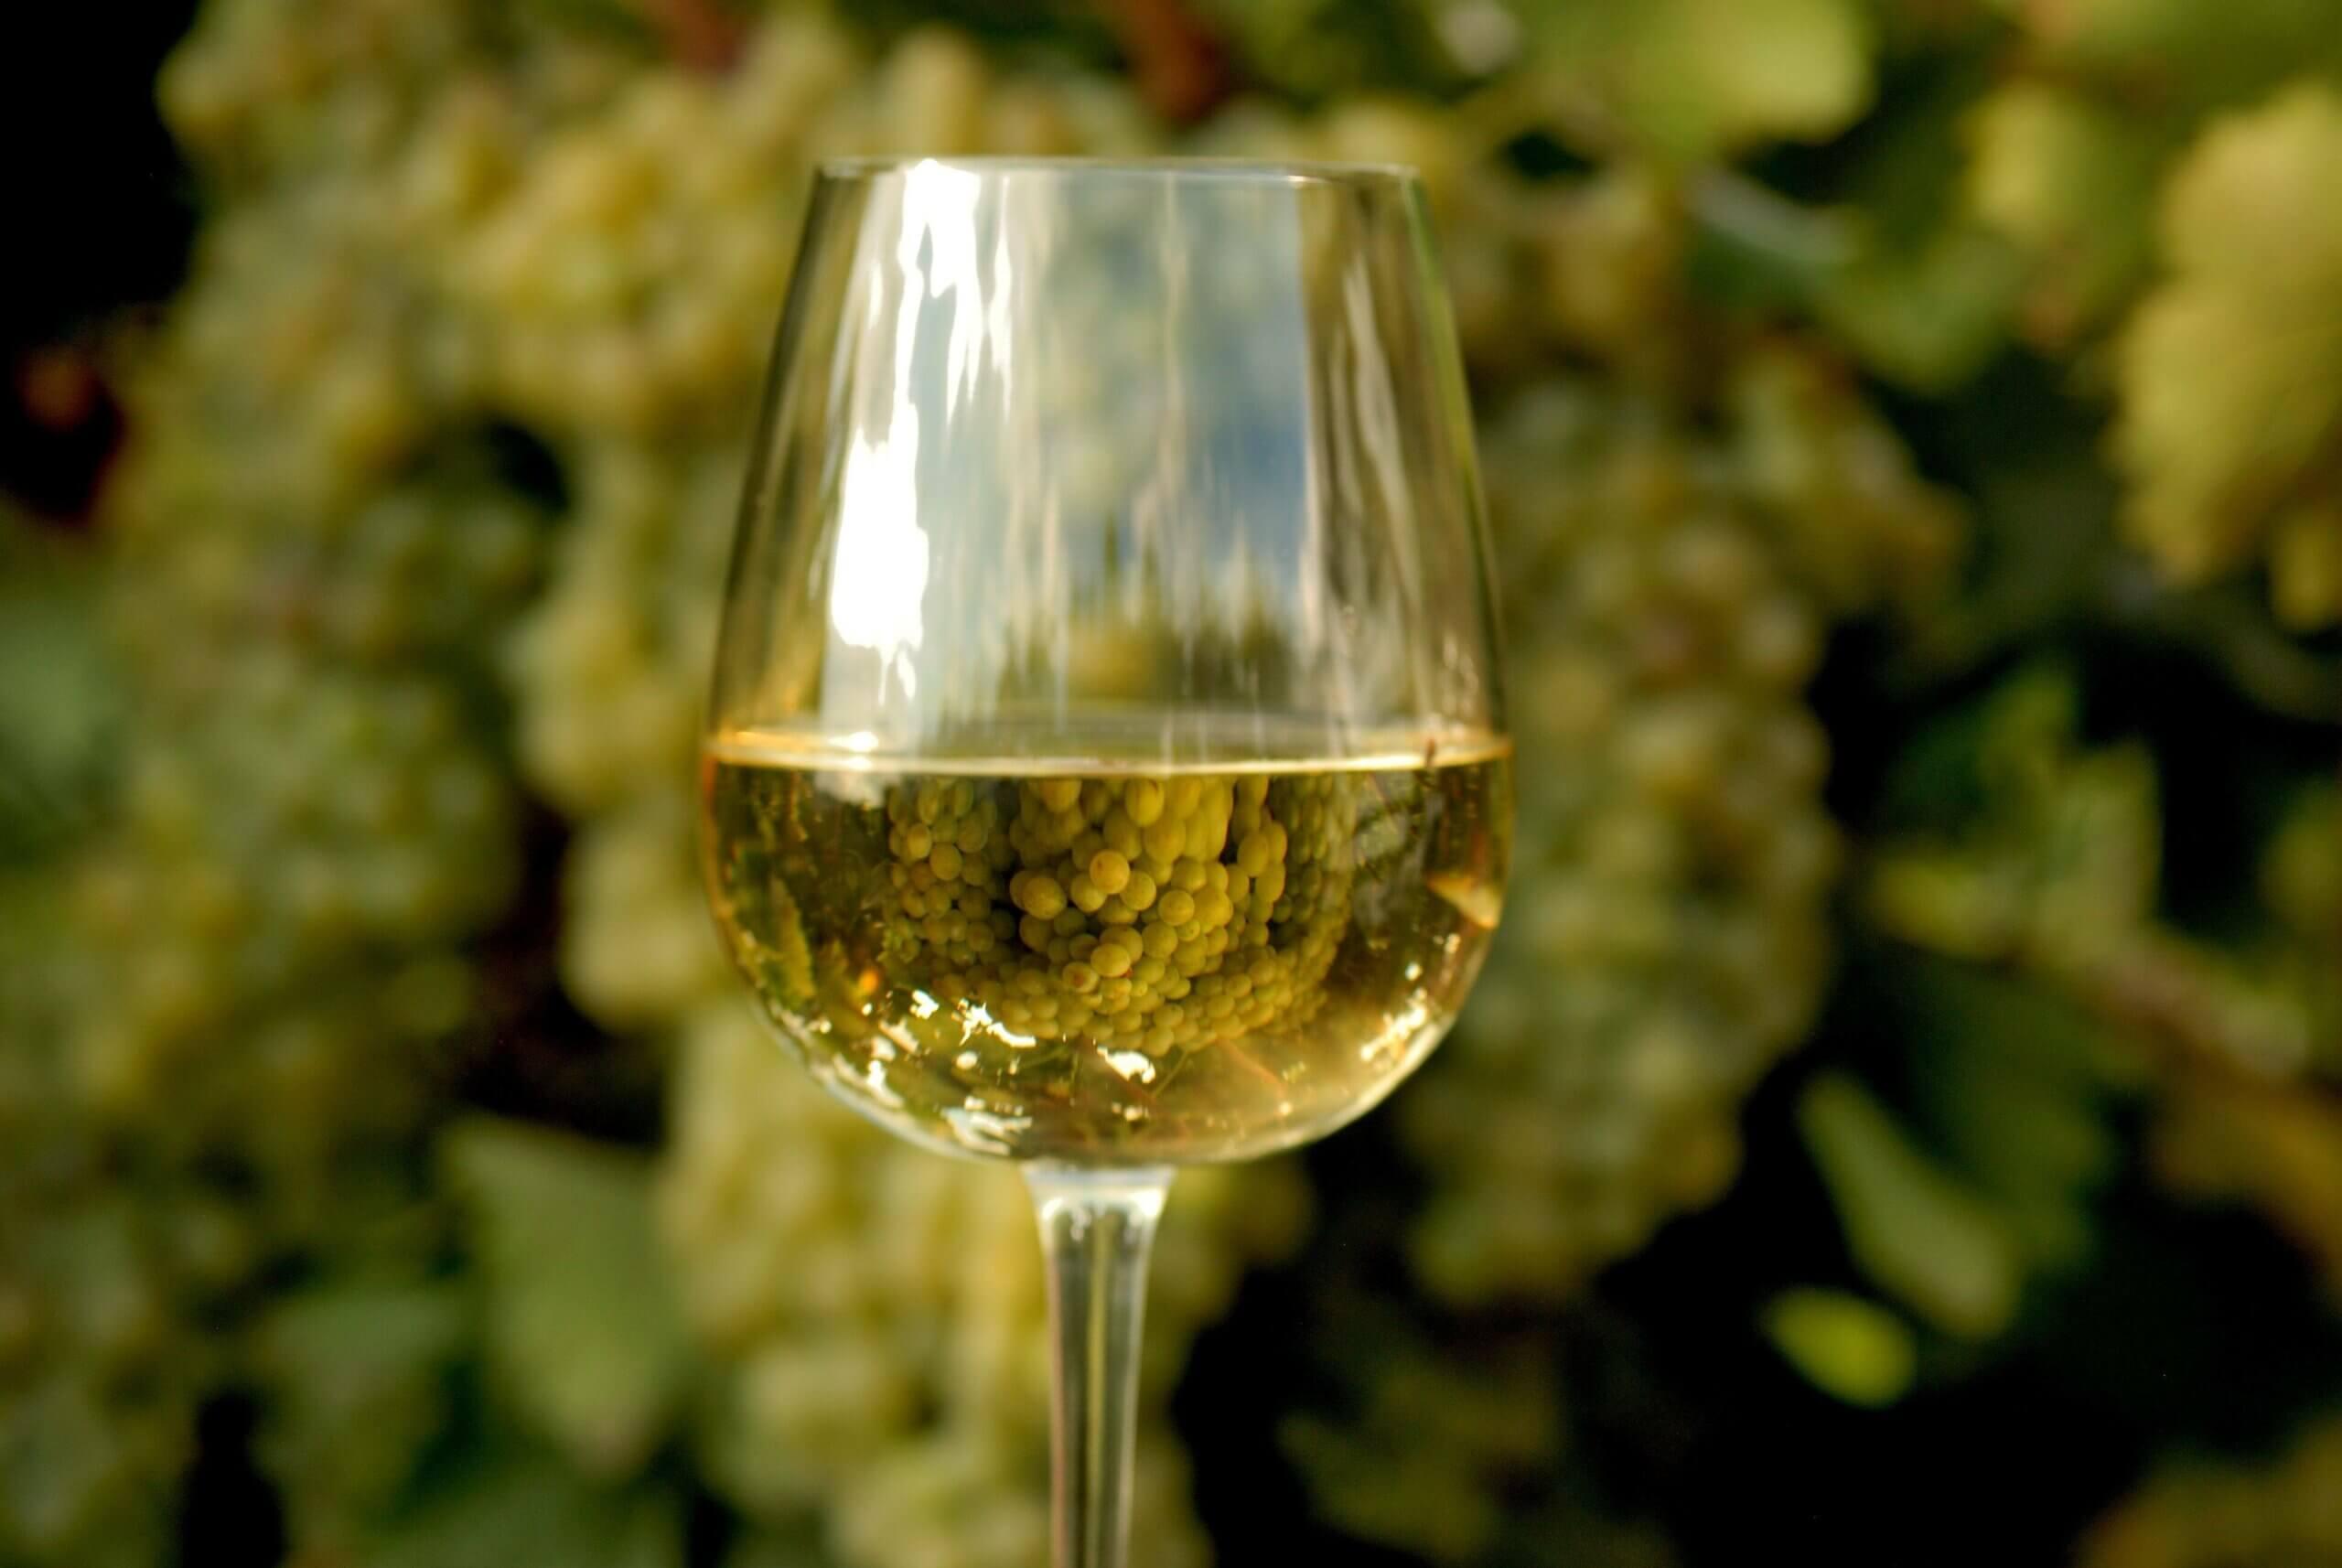 Sip & Read | Chardonnay Day